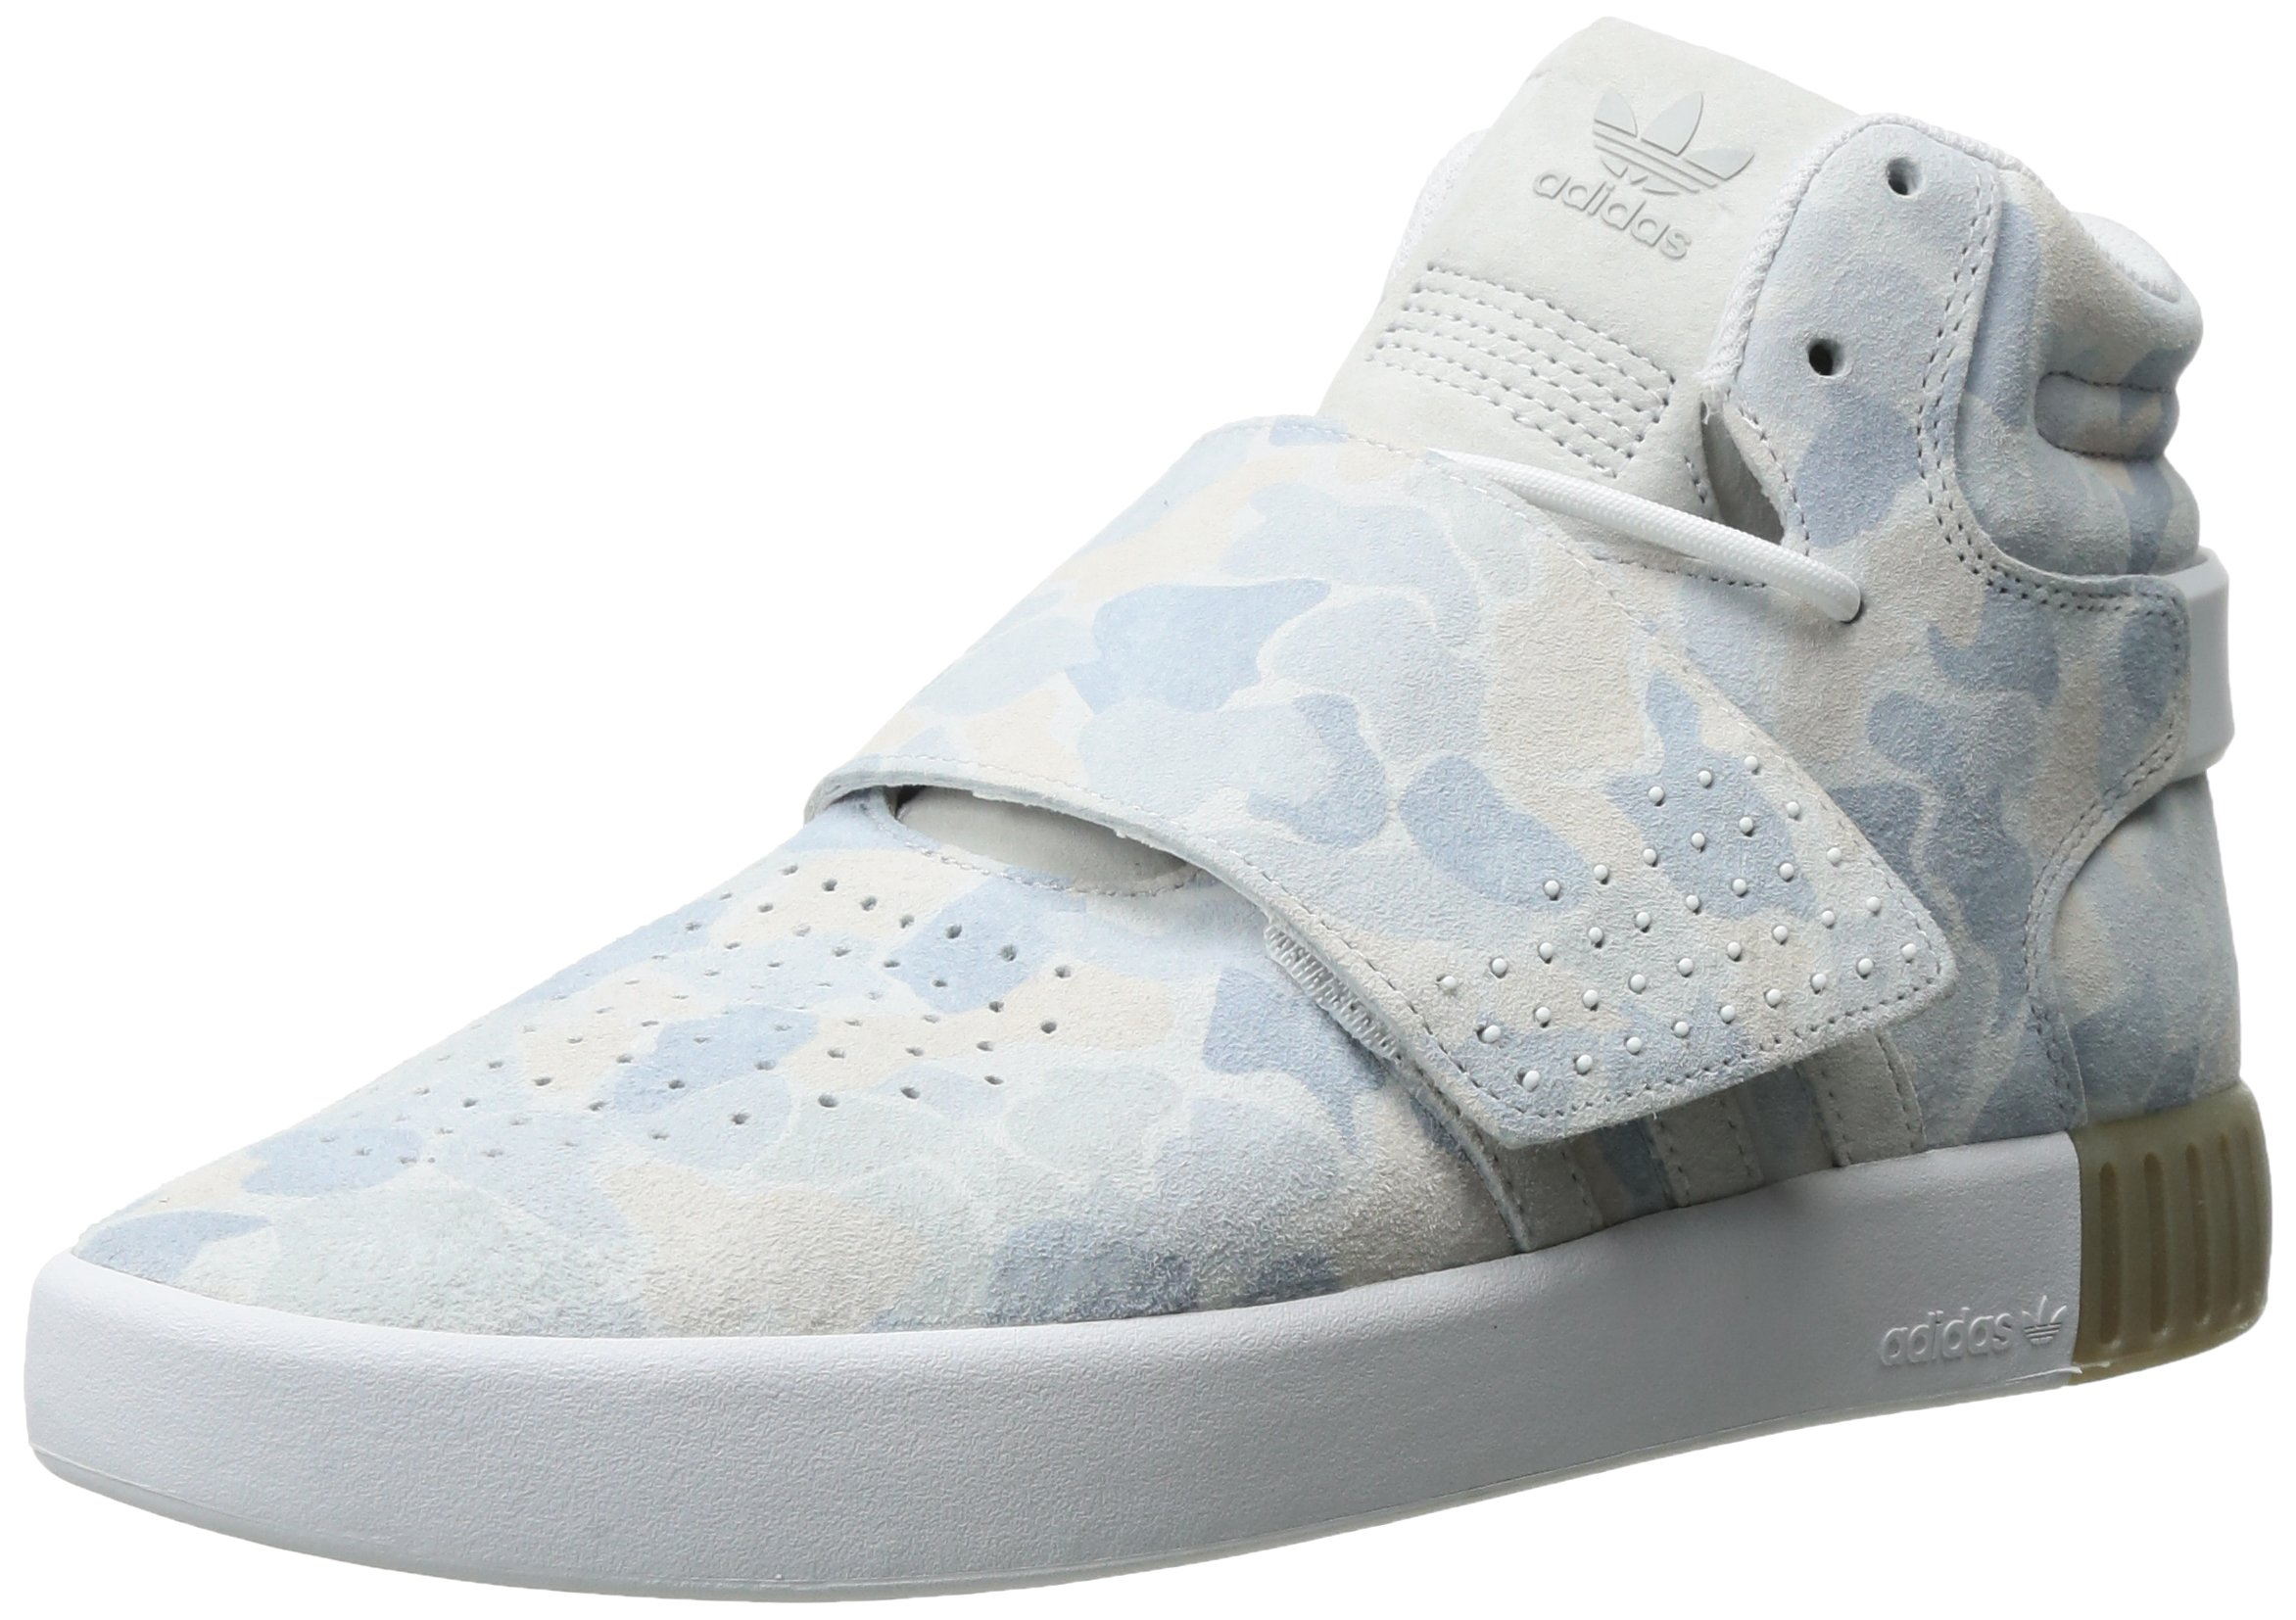 adidas Originals Men's Shoes | Tubular Invader Strap Fashion